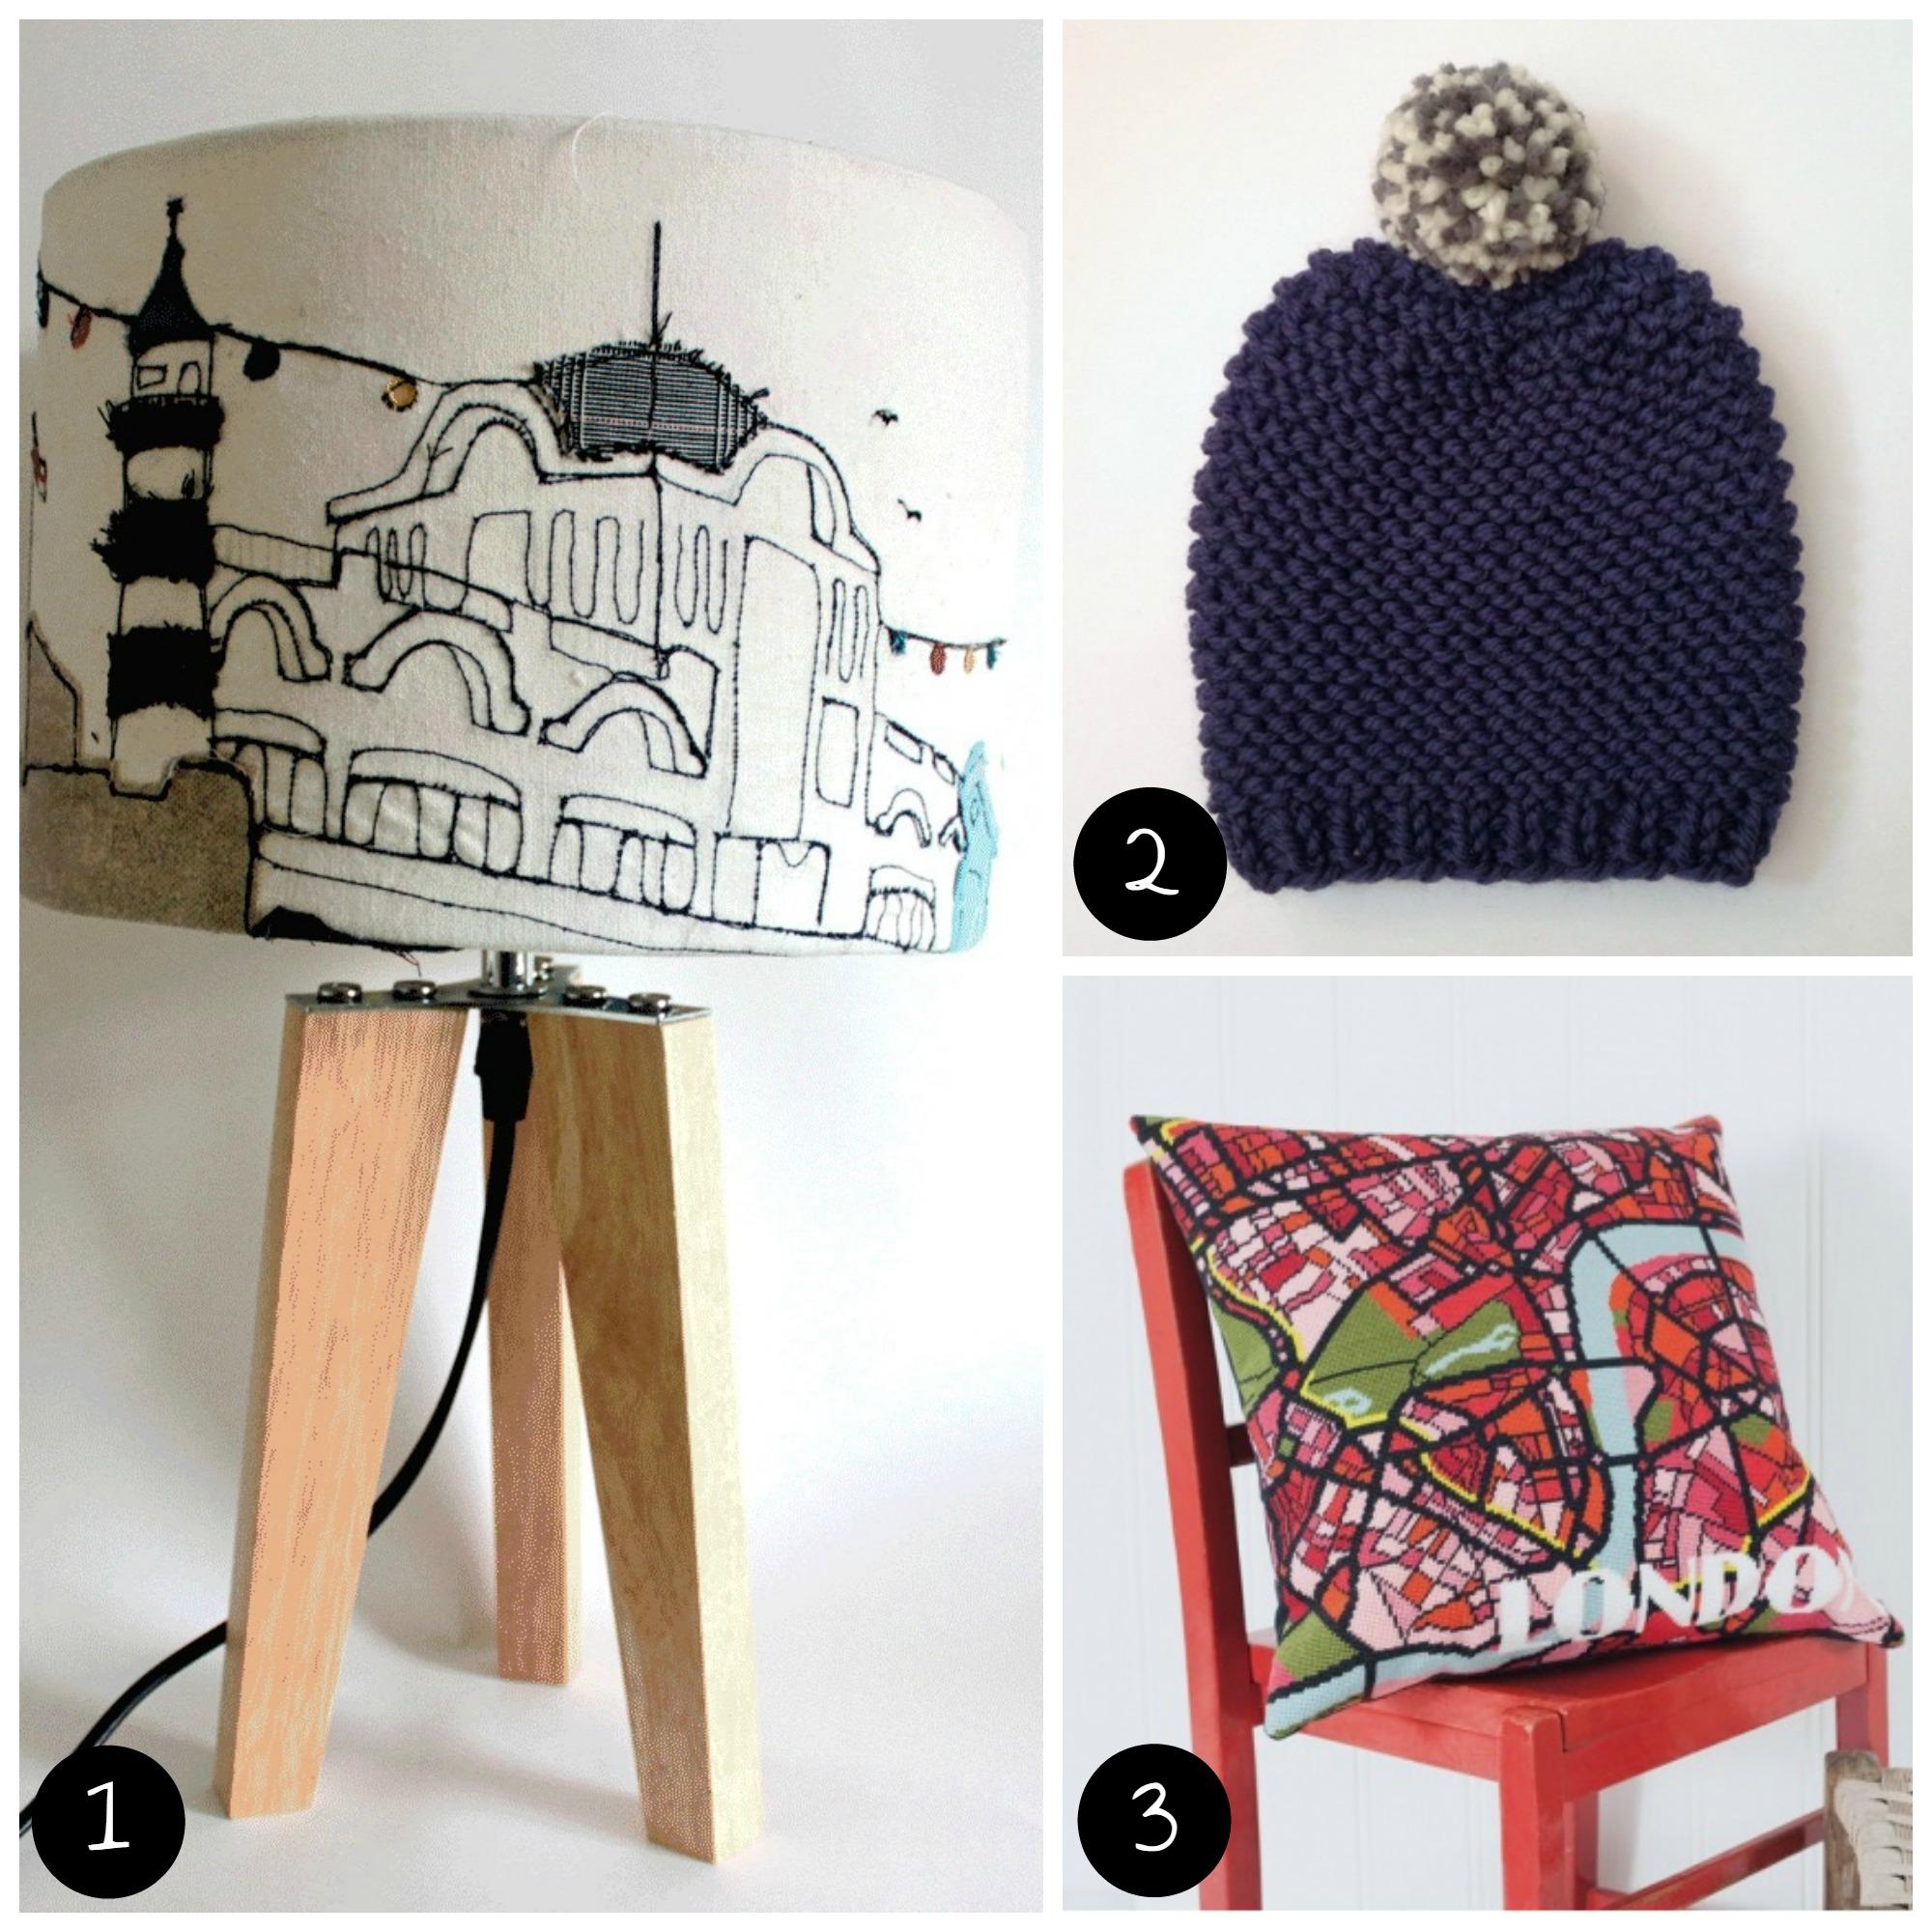 1.  Emma Nicol Illustration  (Brixton - Sun 7 Dec), 2. Miss Knit Nat  (Dalston - Sat 29 Nov), 3.  Hannah Bass Tapestry  (Brixton - Sat 6 Dec).